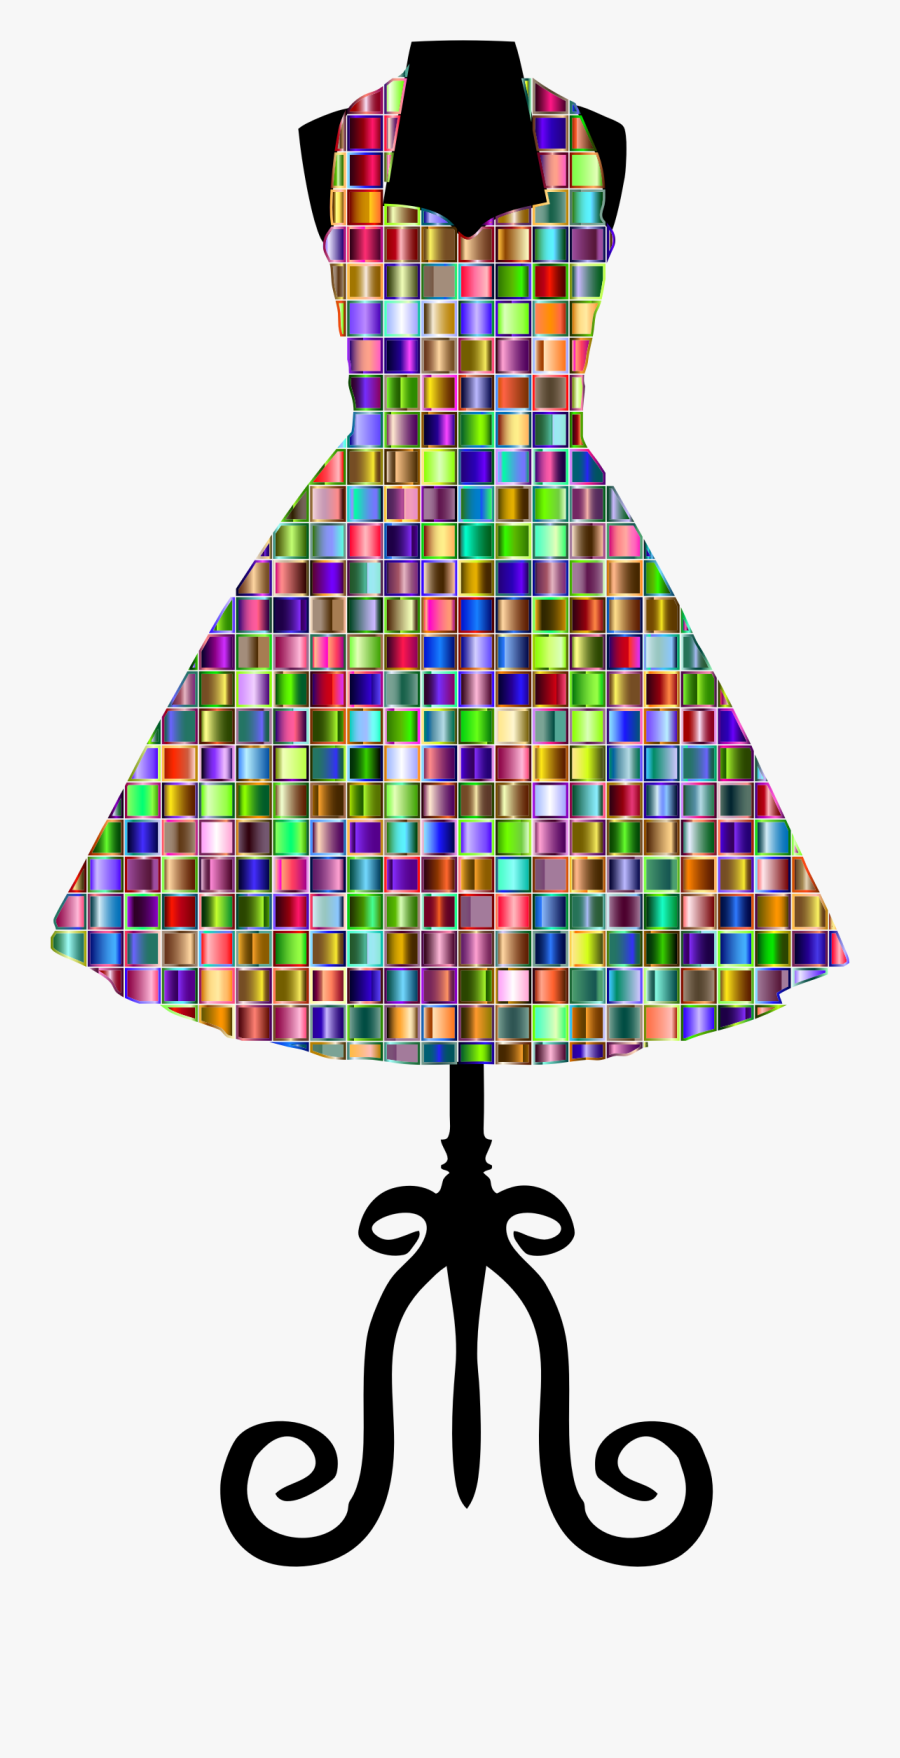 Get Dressed Clipart Dress Ideas - Dress Clipart, Transparent Clipart